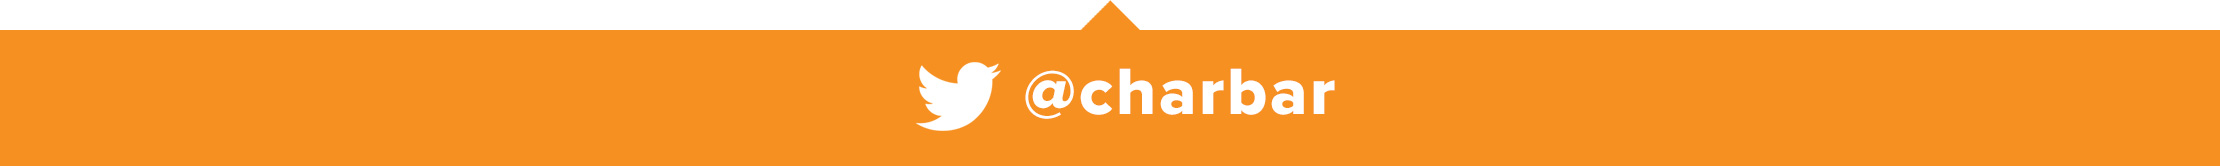 charbar_twitter.jpg